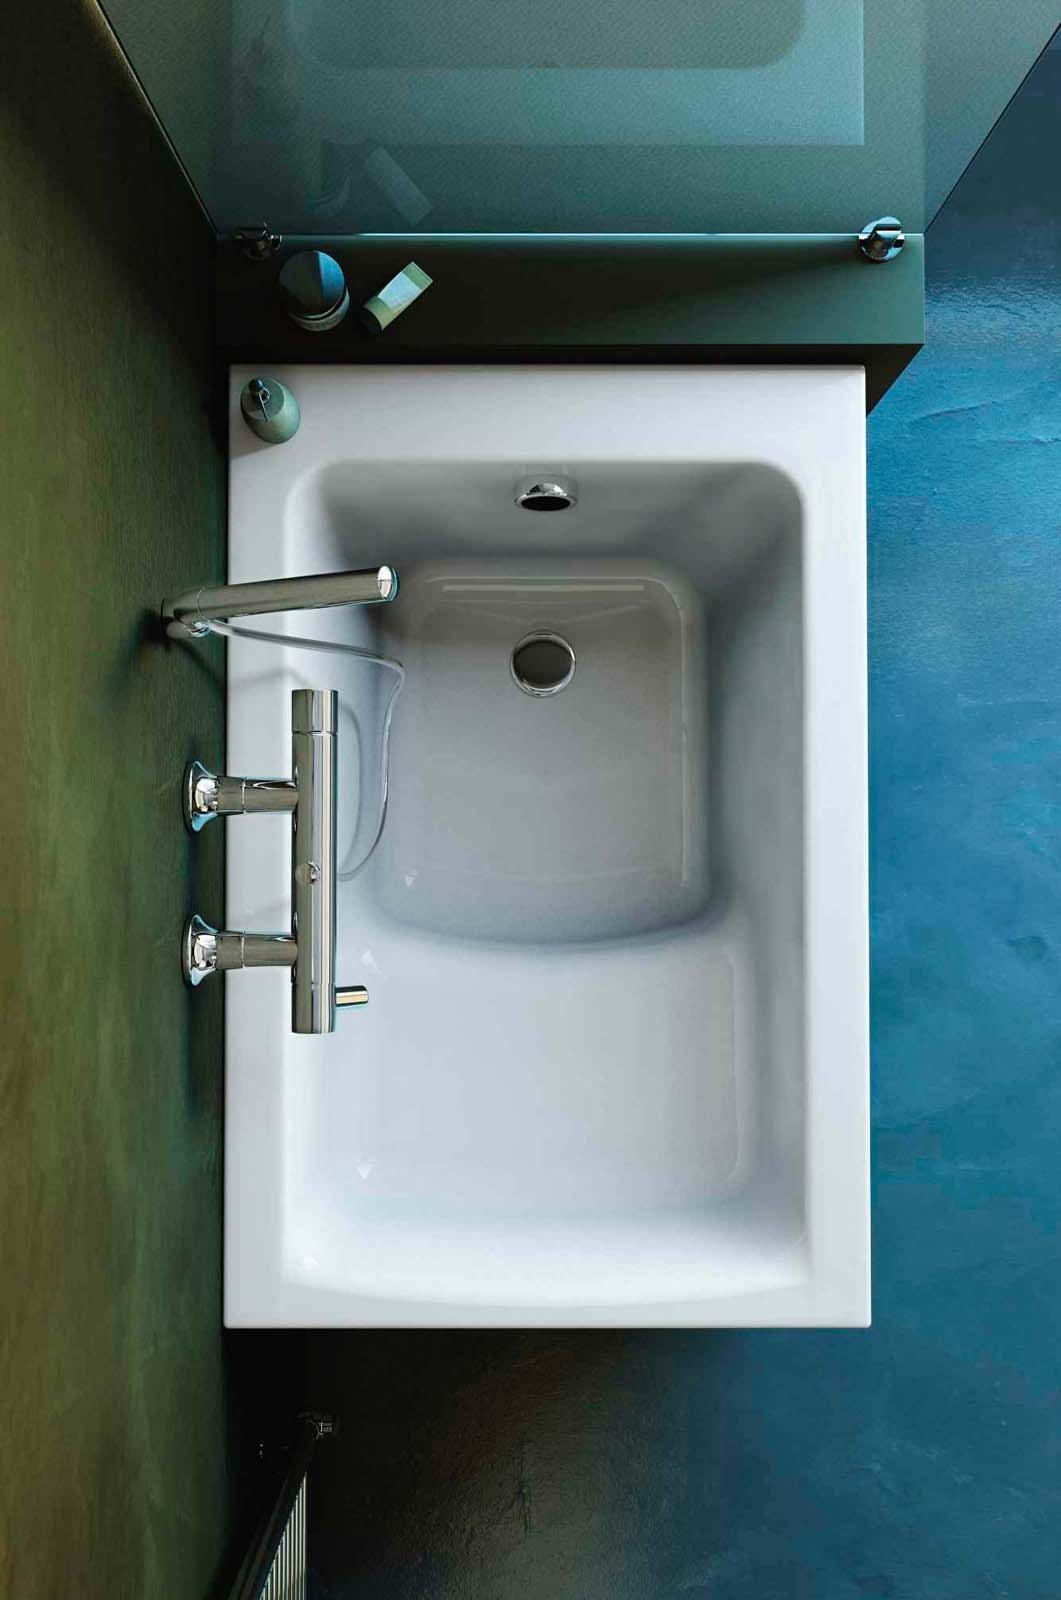 Vasche da bagno low cost a partire da 182 euro cose di casa - Piccola vasca da bagno ...